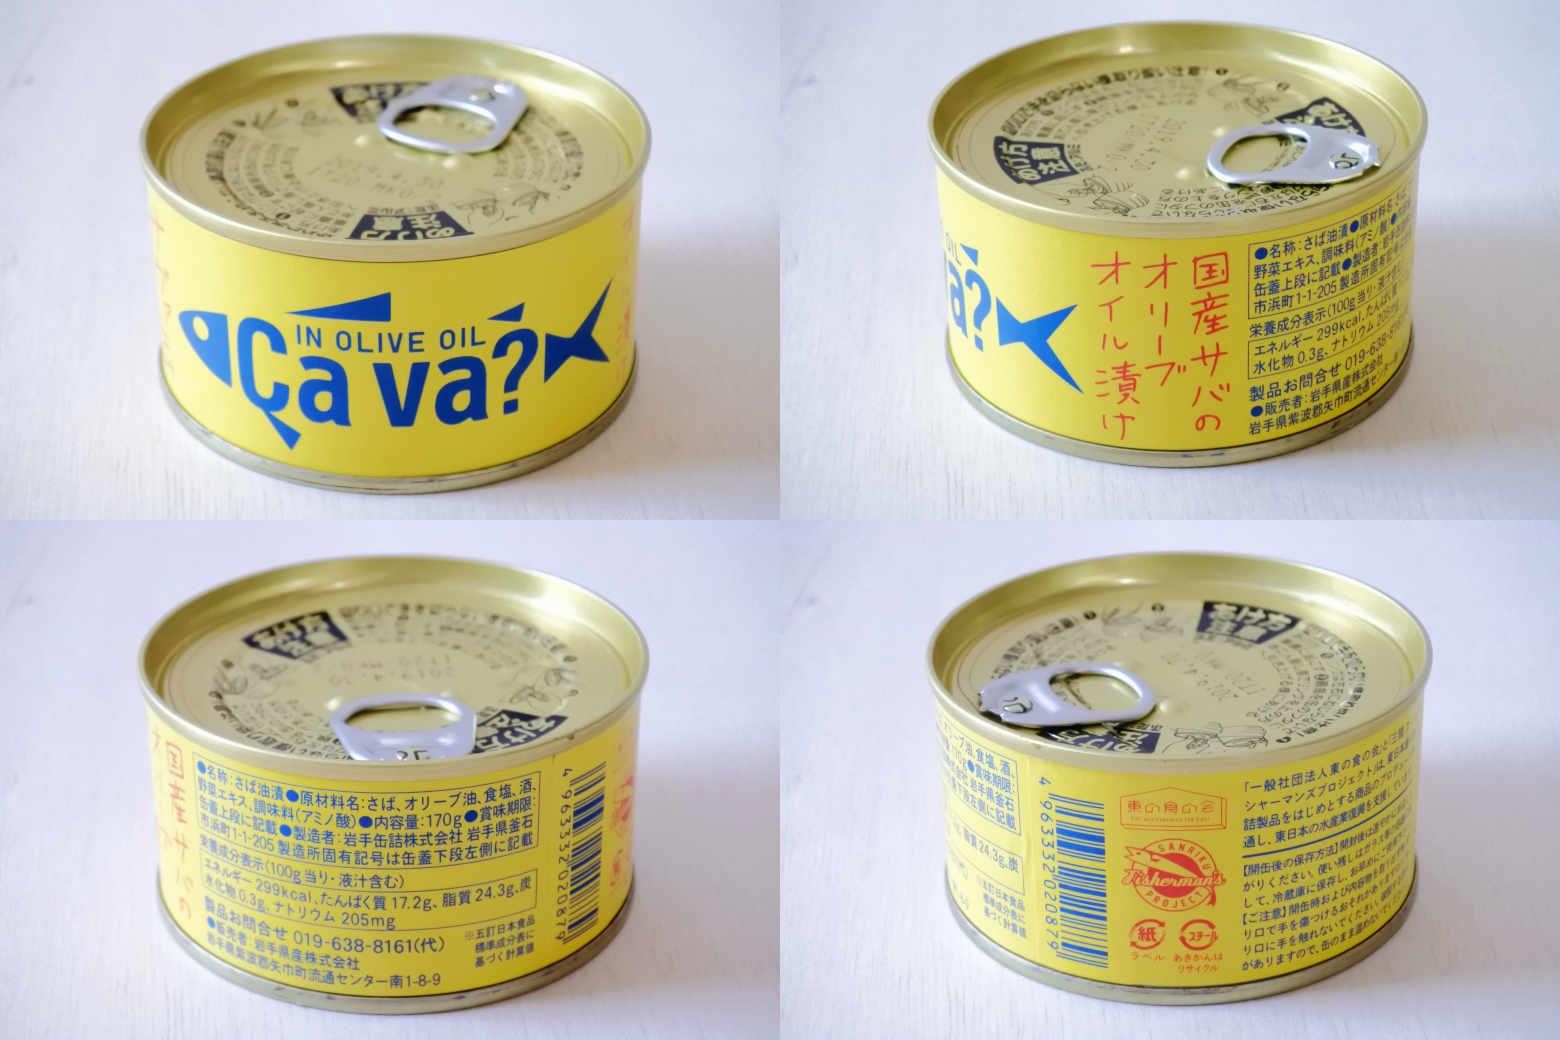 サヴァ缶は国産サバのオリーブオイル漬け